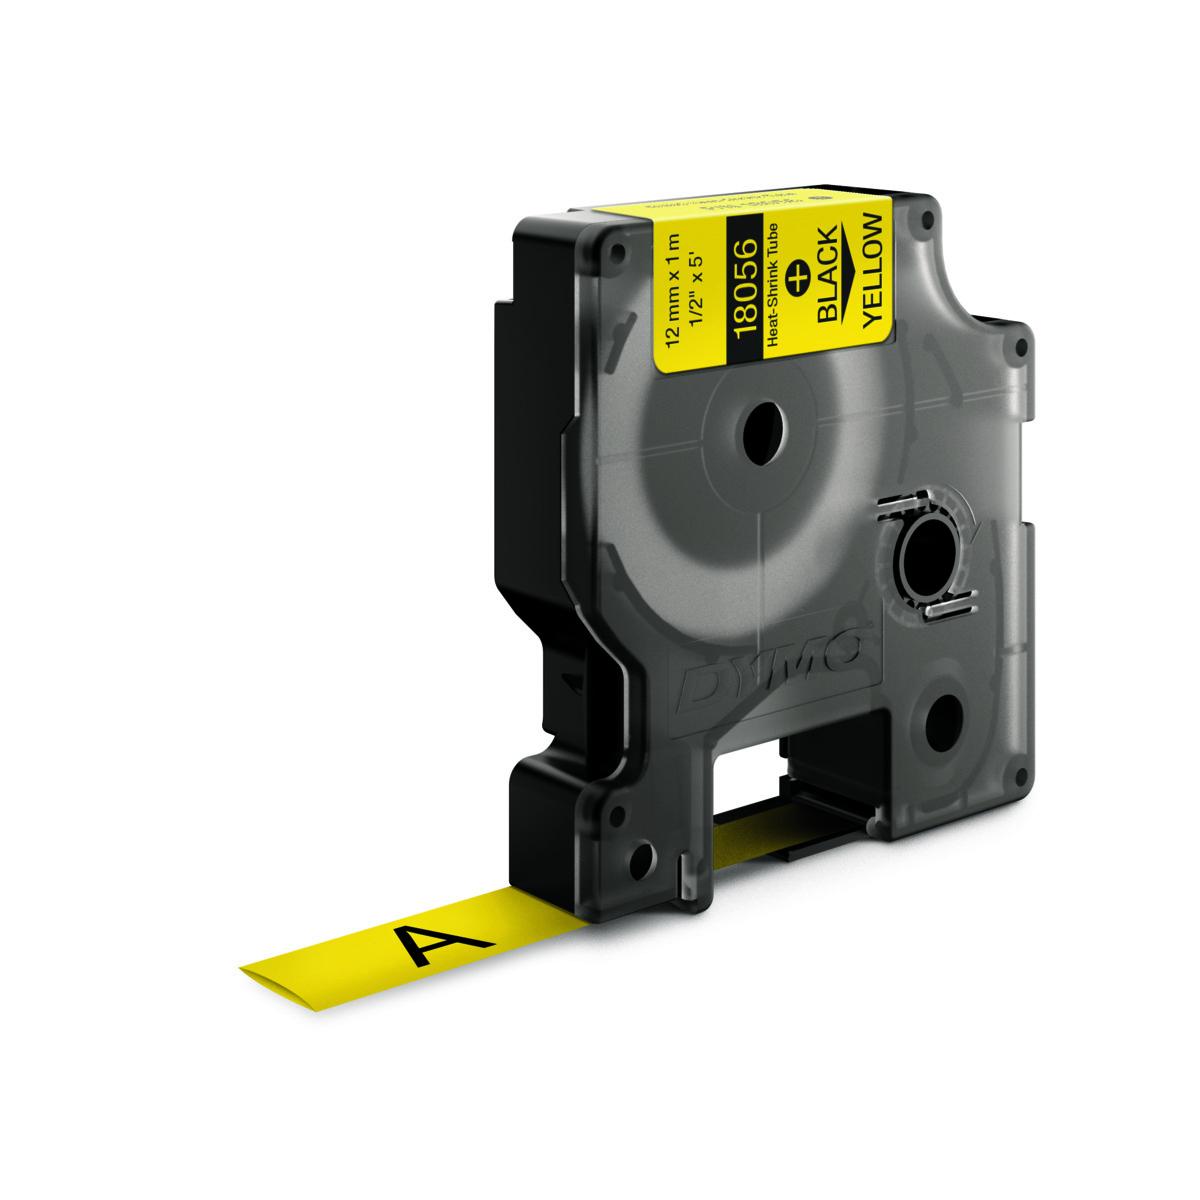 Dymo RHINO 18056 - IND Krimpkous label - 12mm zwart op geel